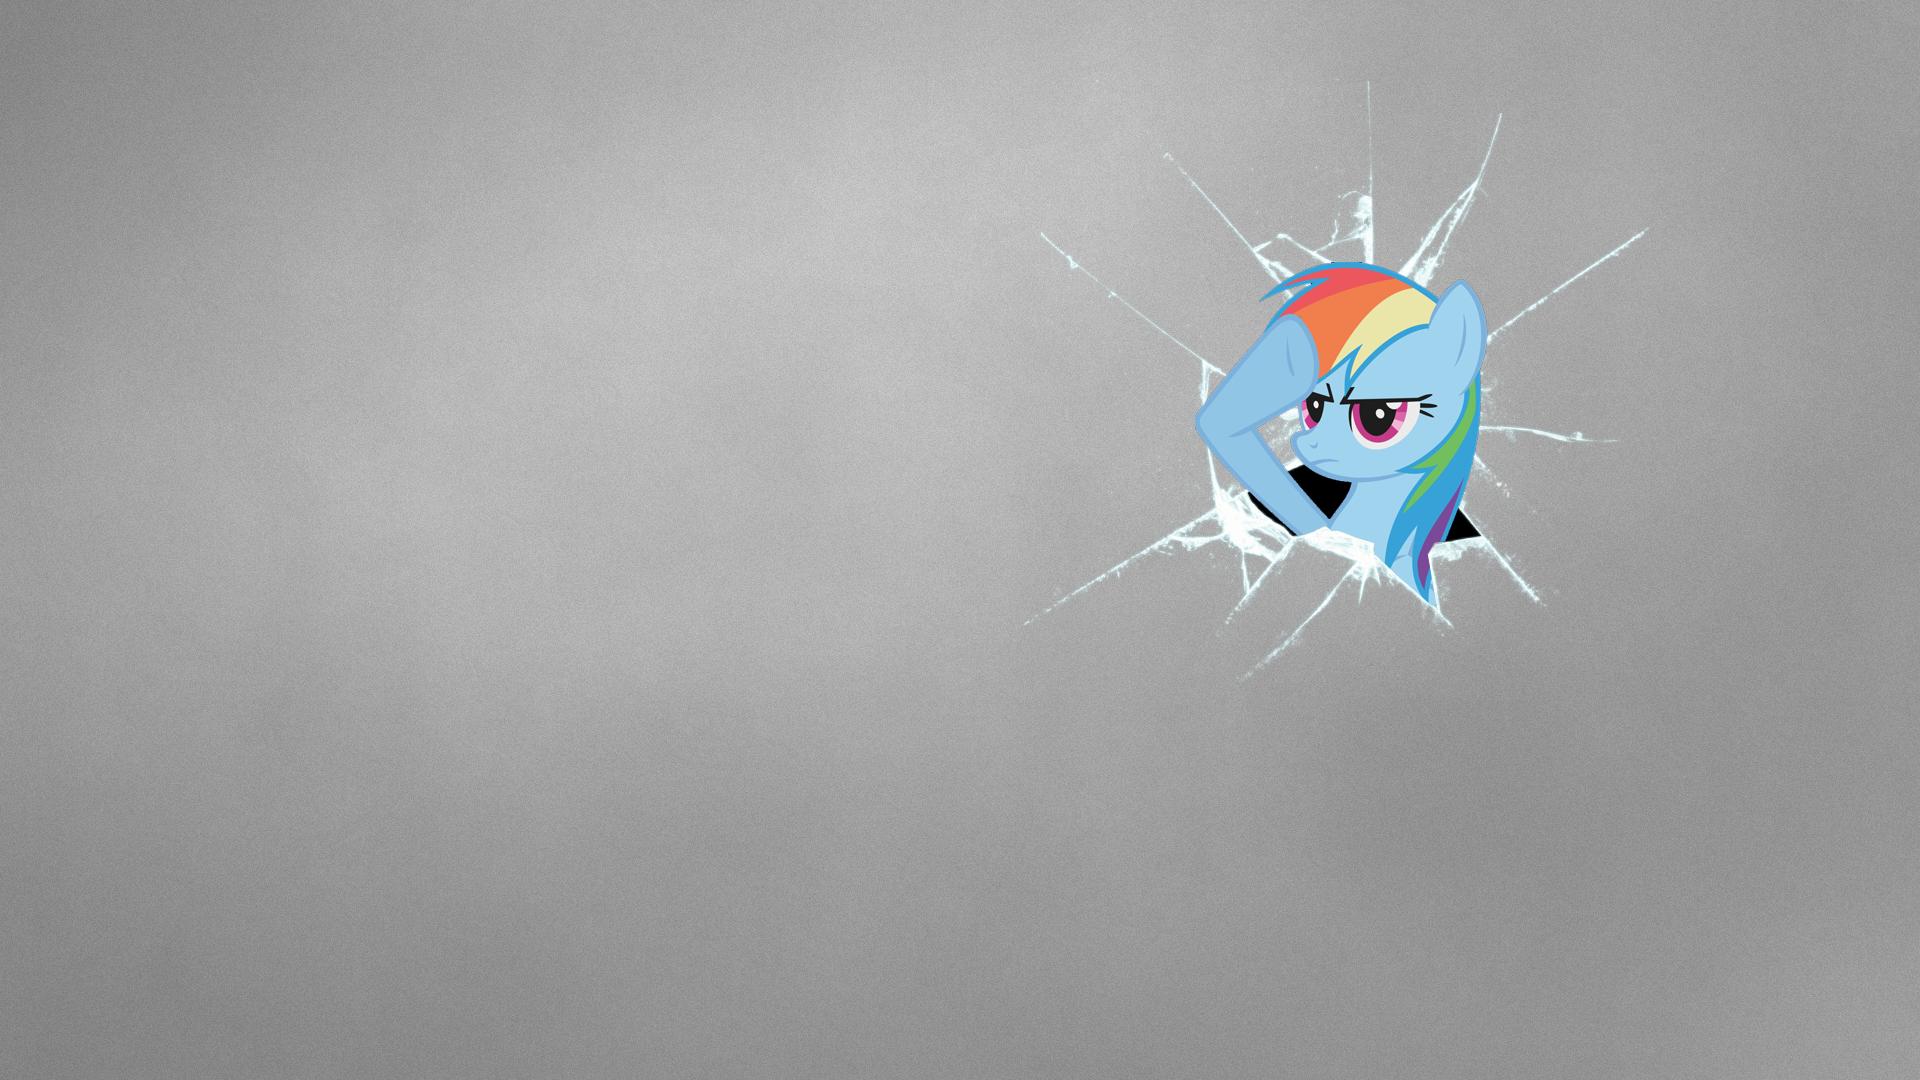 Rainbow Dash Wallpaper 1920X1080 wallpaper   553879 1920x1080